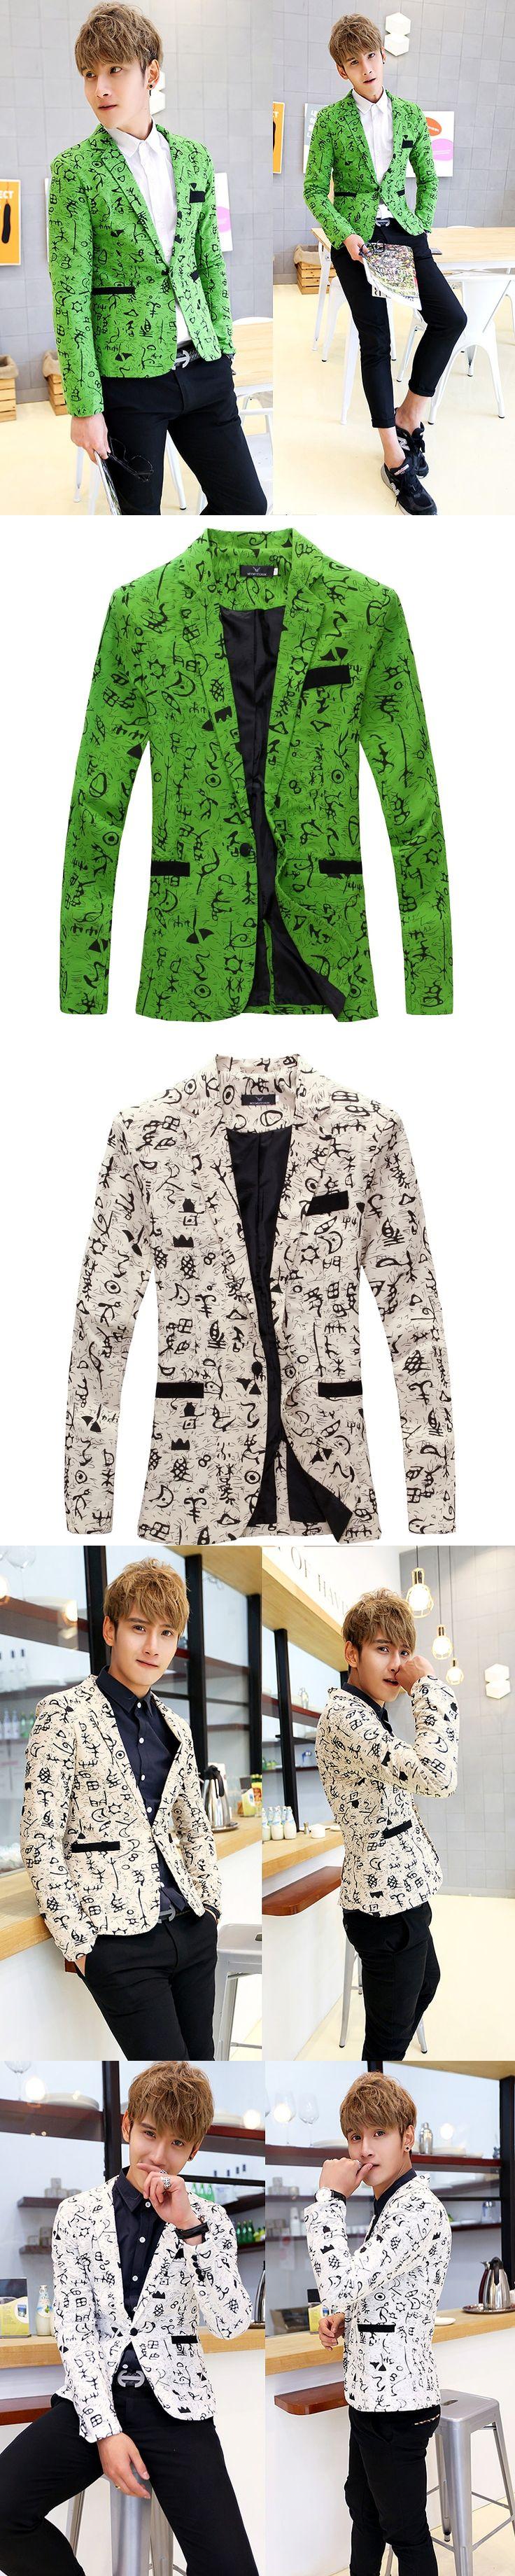 Fashion Men Blazer Designs Kpop Single Button Printed Slim fit Blazer Jacket Masculino Casual Suit Stage Wear Costume Homme z15